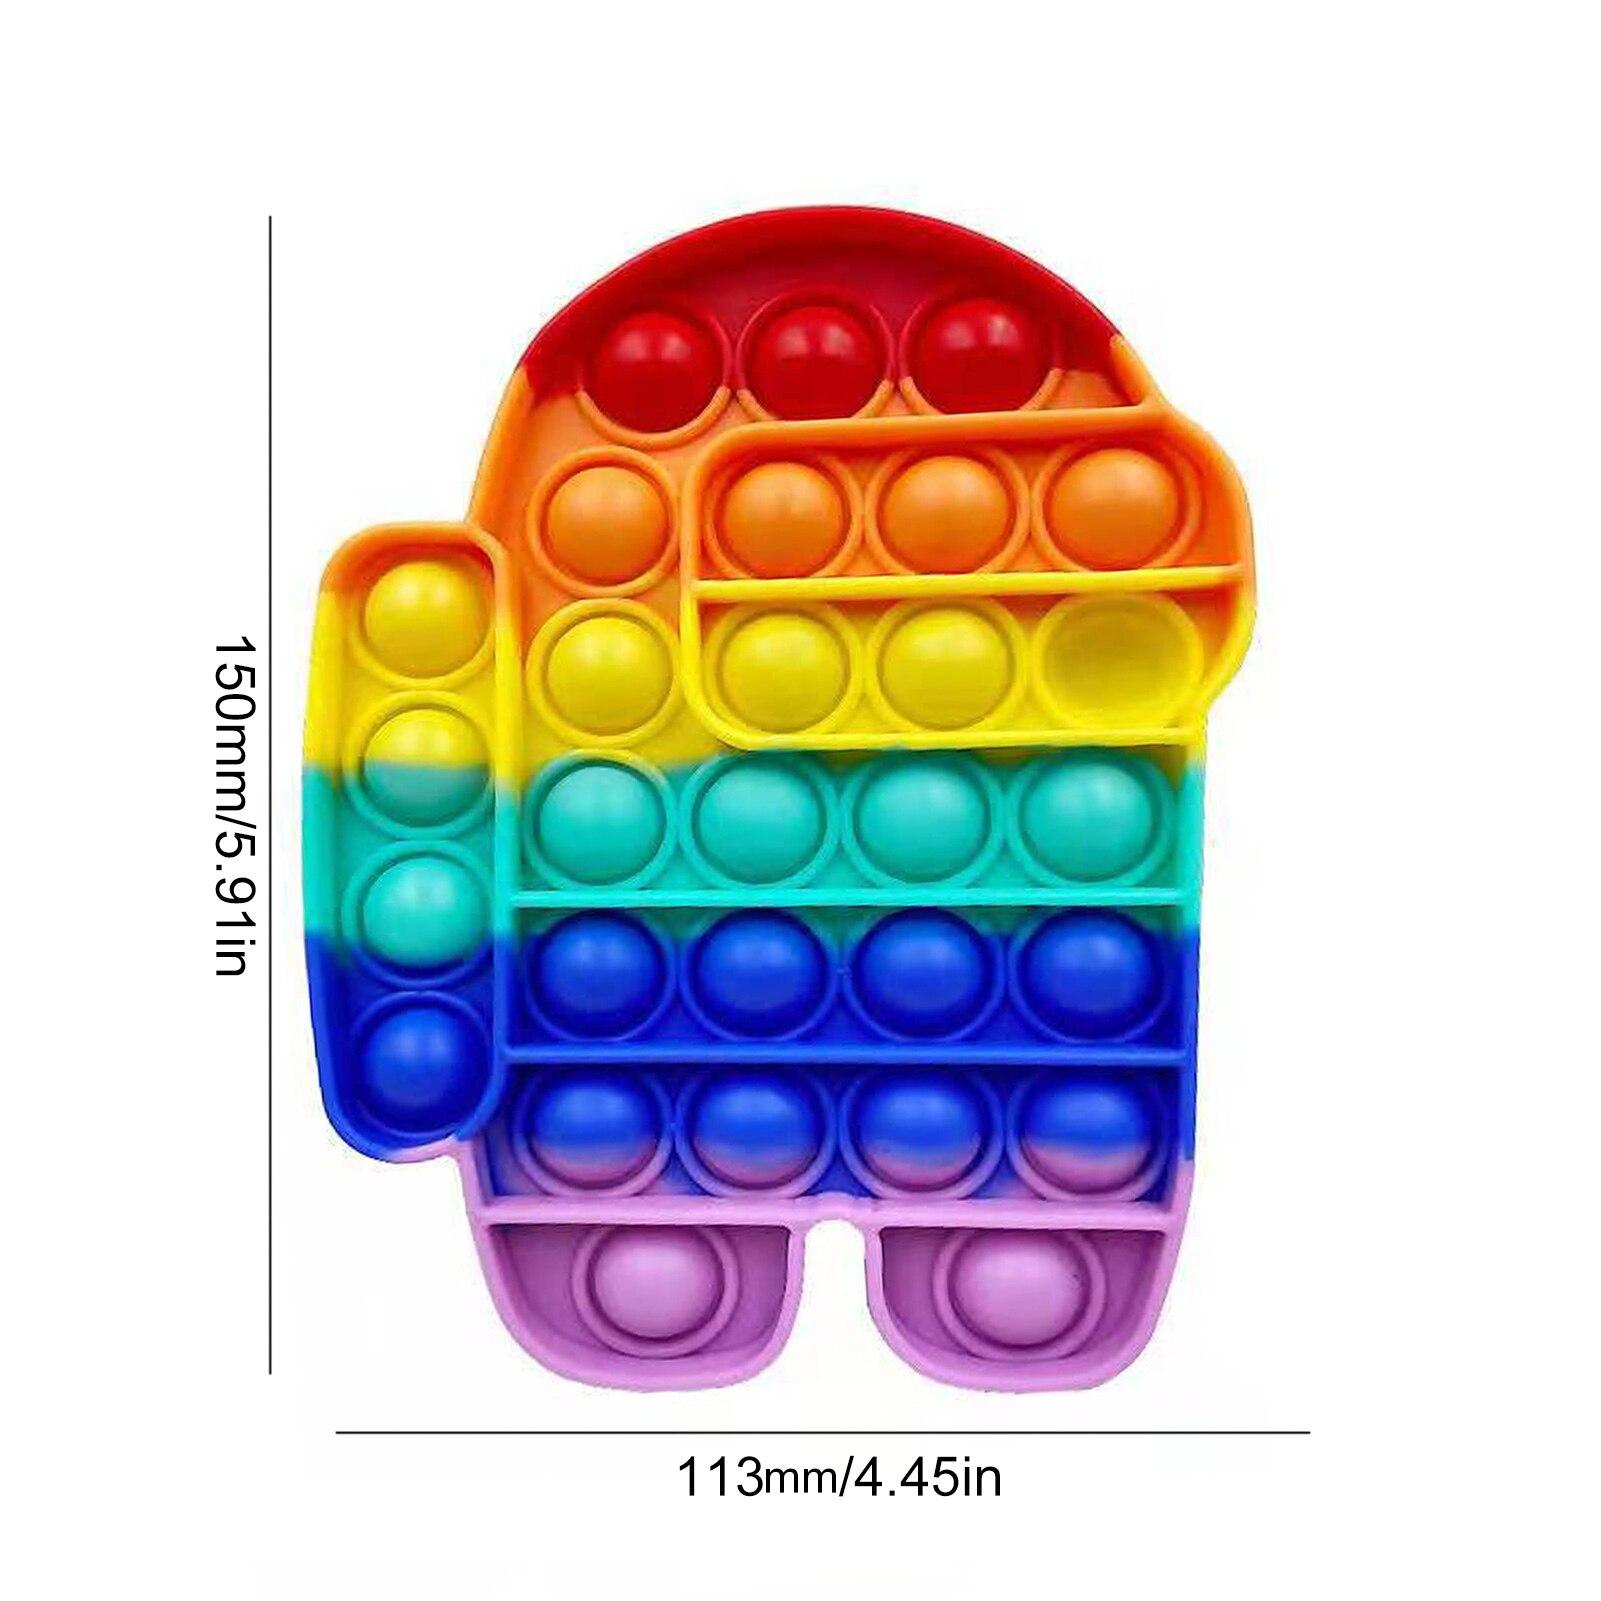 Fidget-Toys Relief-Toy Box Poppit Pop It Push Bubble Anti-Stress Squishy Gift Soft New img3